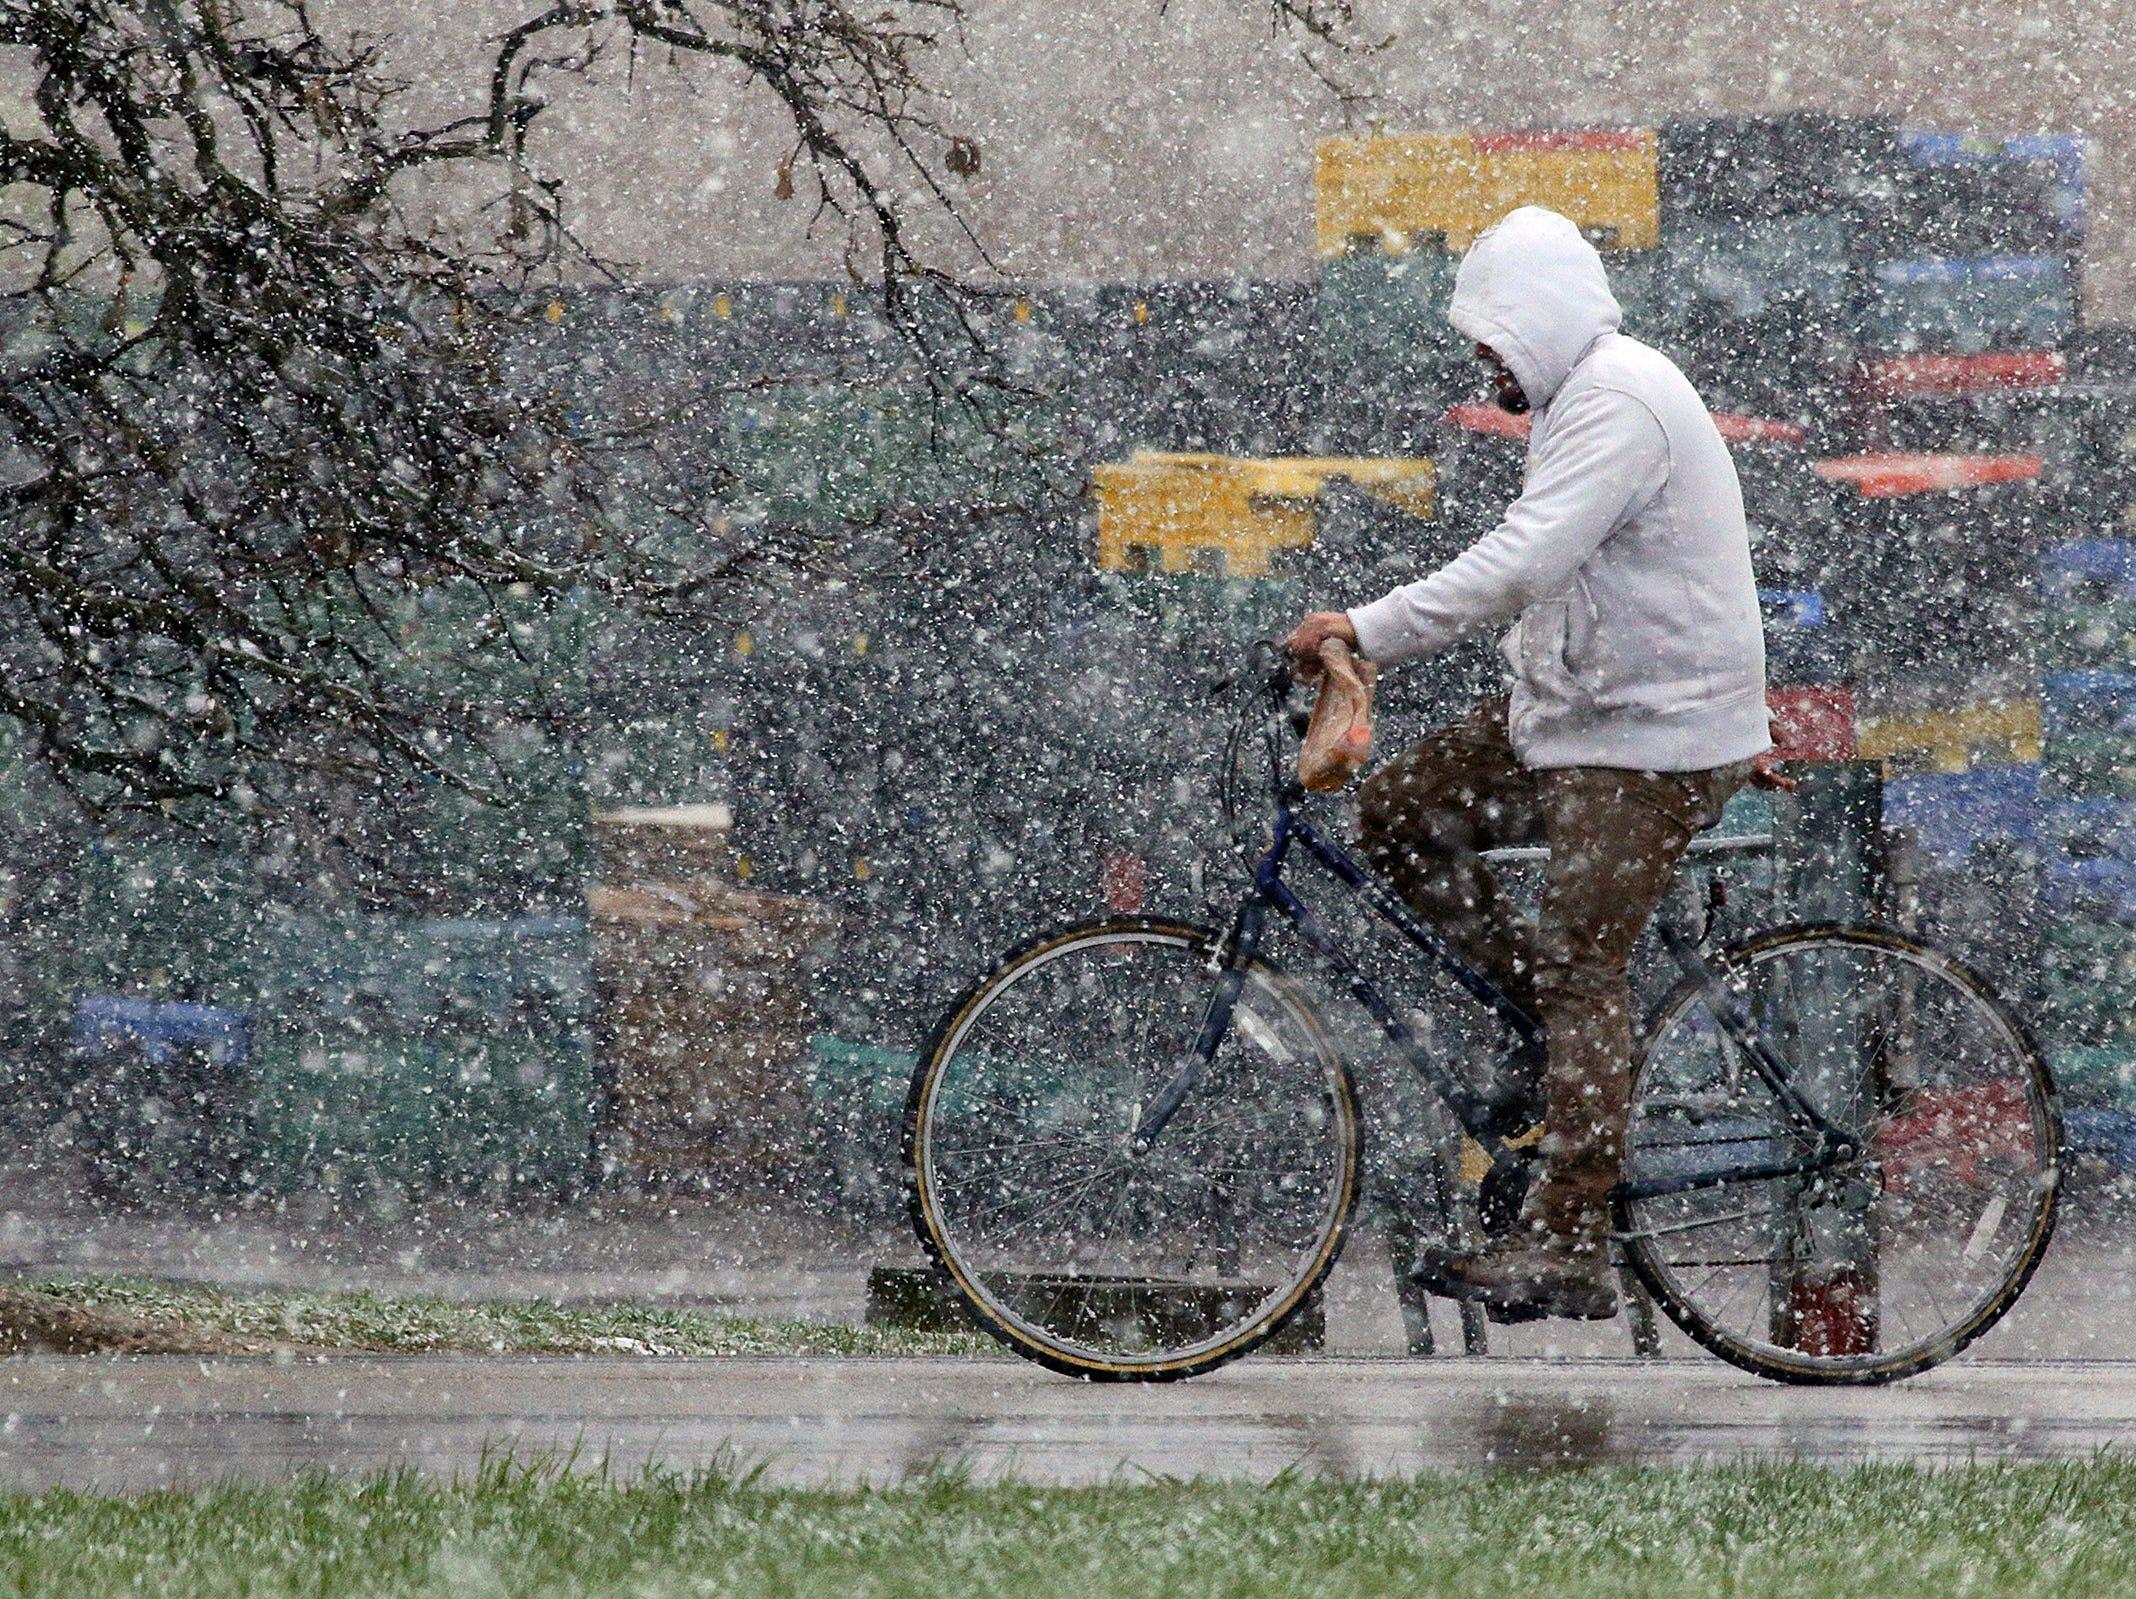 A man rides his bike through the snow along Allanson Road in Mundelein, Ill. Saturday morning, April 27, 2019.